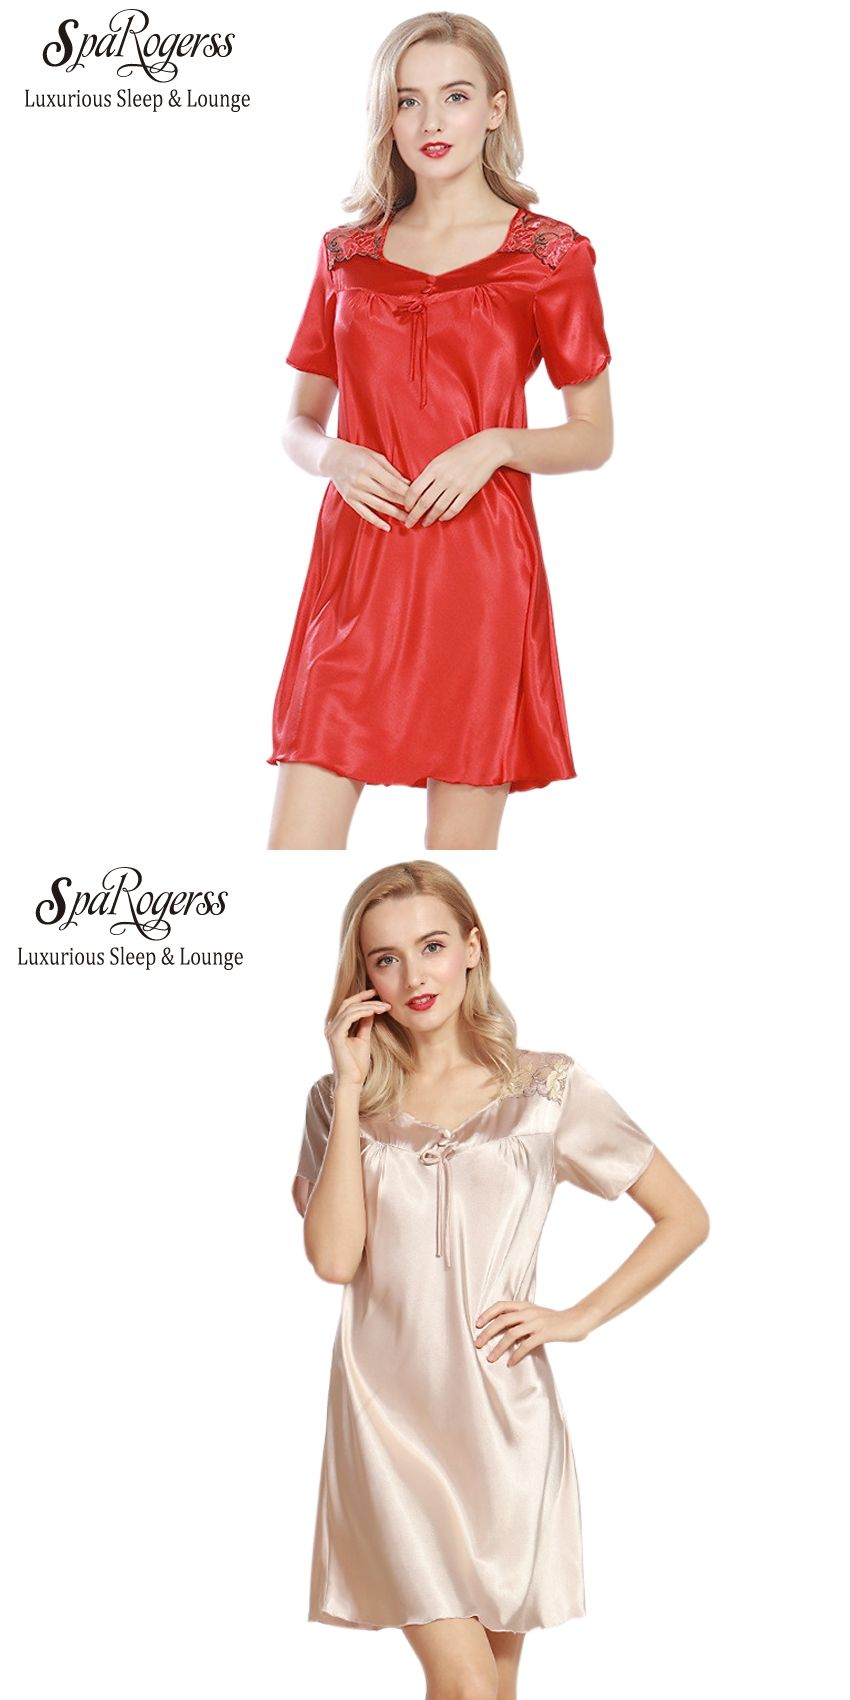 SpaRogerss Luxurious Women Nightgowns 2017 New Faux Silk Lady Summer  Sleepshirts Female Dressing Gowns Sleep Lounge Woman SQ313  ed5184f46